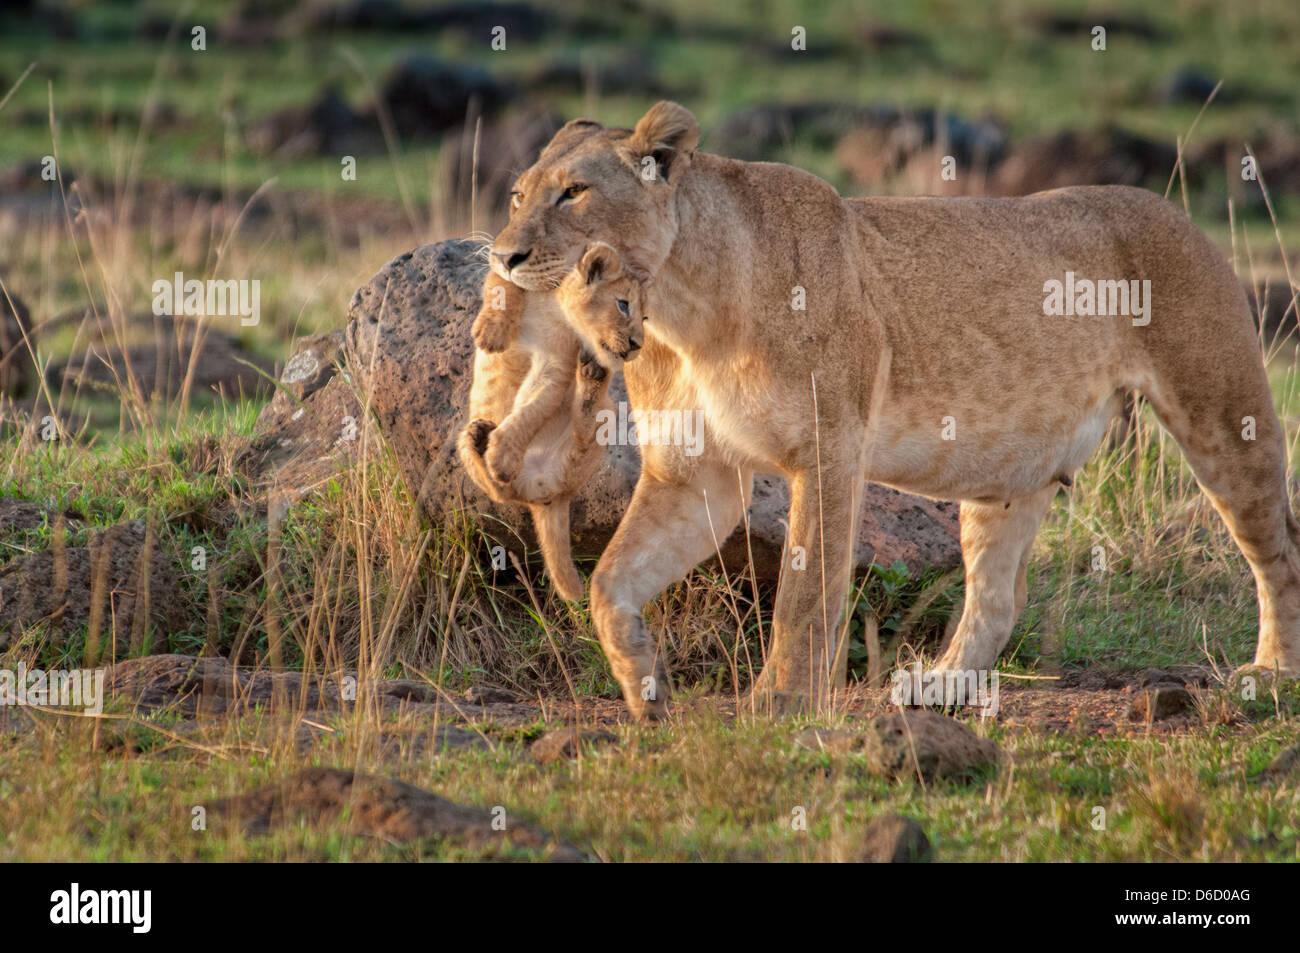 Leona, Panthera leo, llevando un cachorro en su boca, Reserva Nacional de Masai Mara, Kenya, Africa. Imagen De Stock